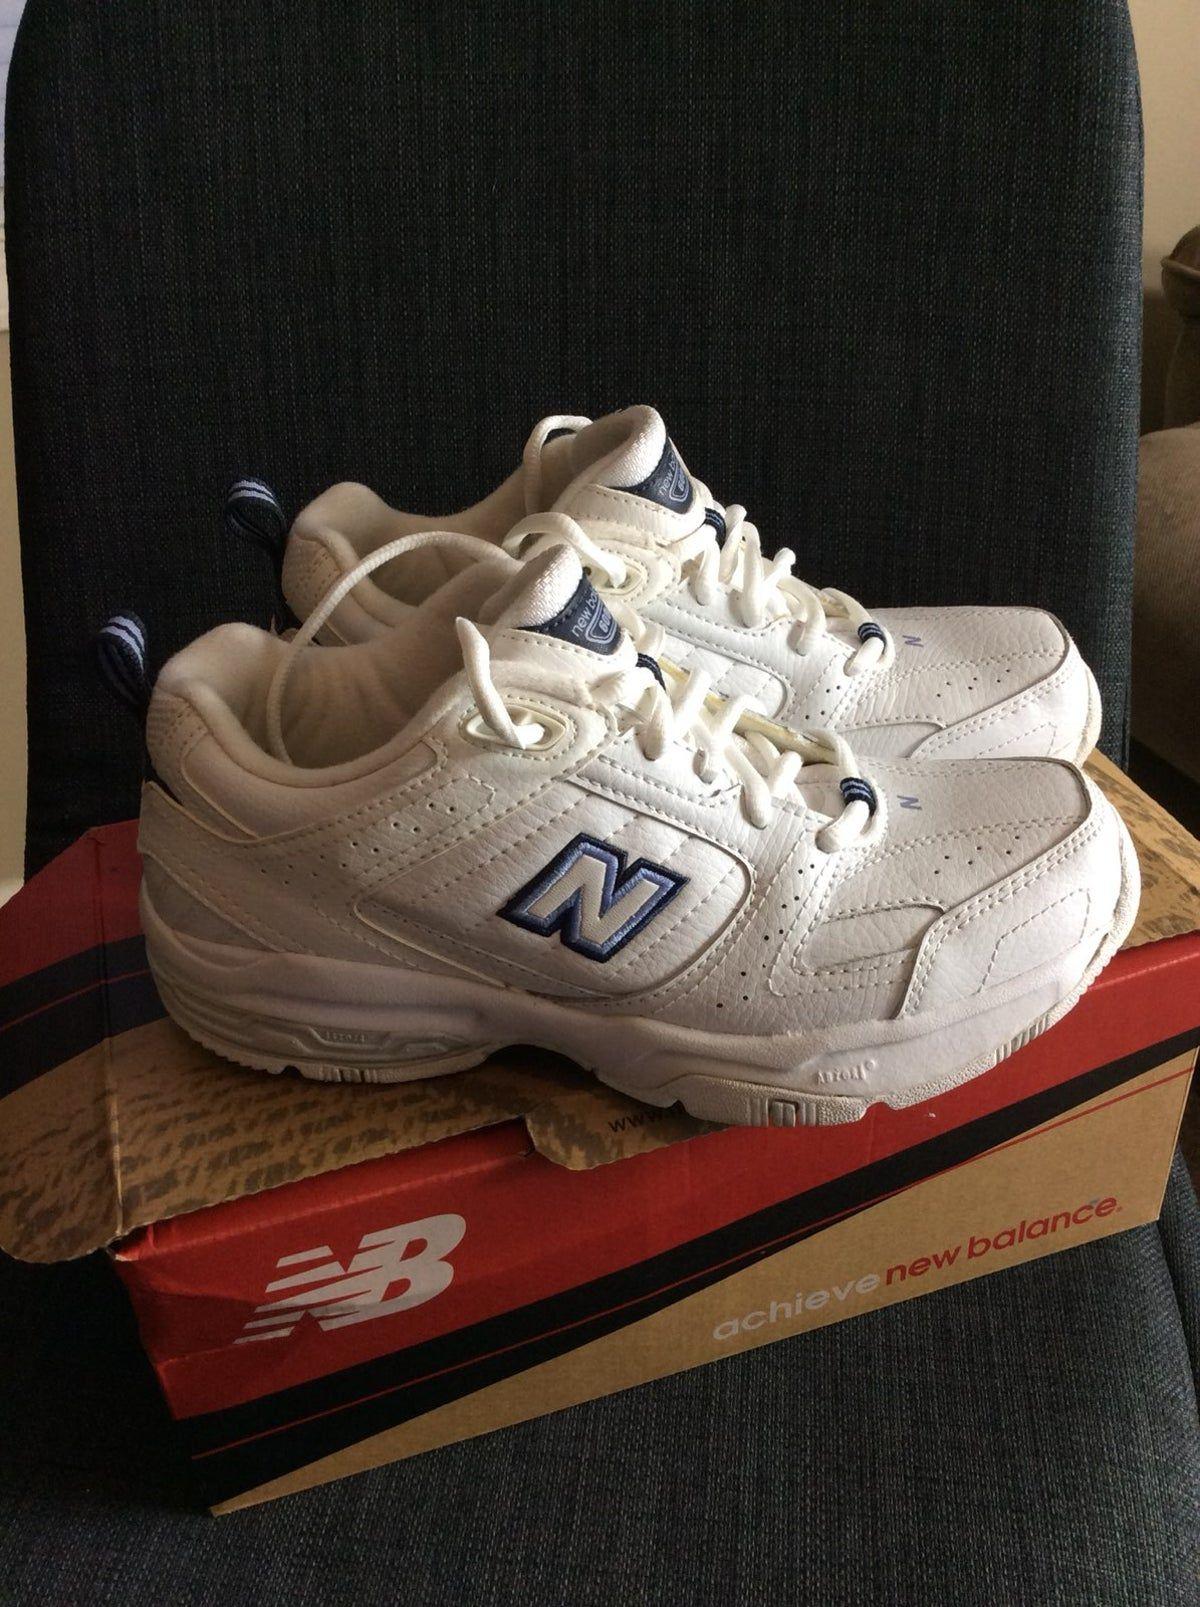 New Balance shoes 608v2 womens 6 1/2 B